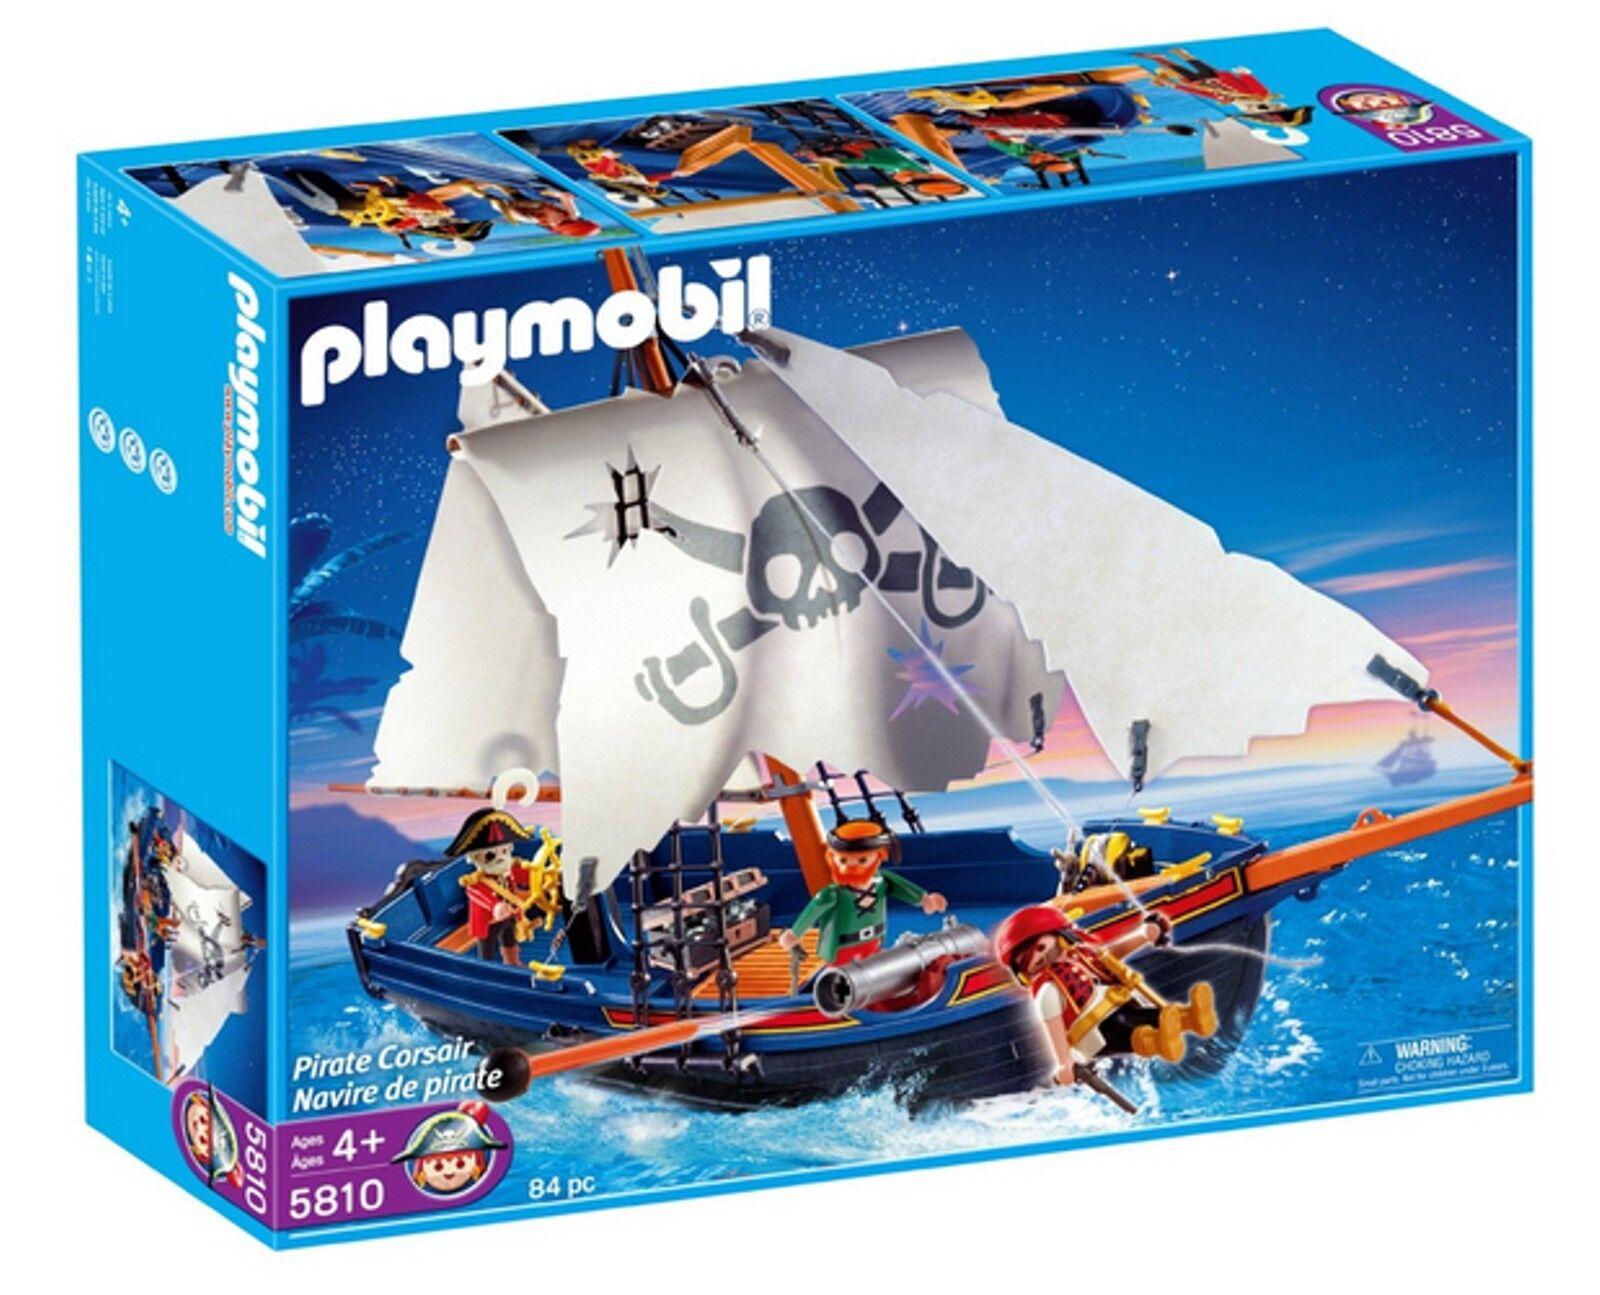 Playmobil 5810 Pirate Corsair Pirate Ship NIB-Mint